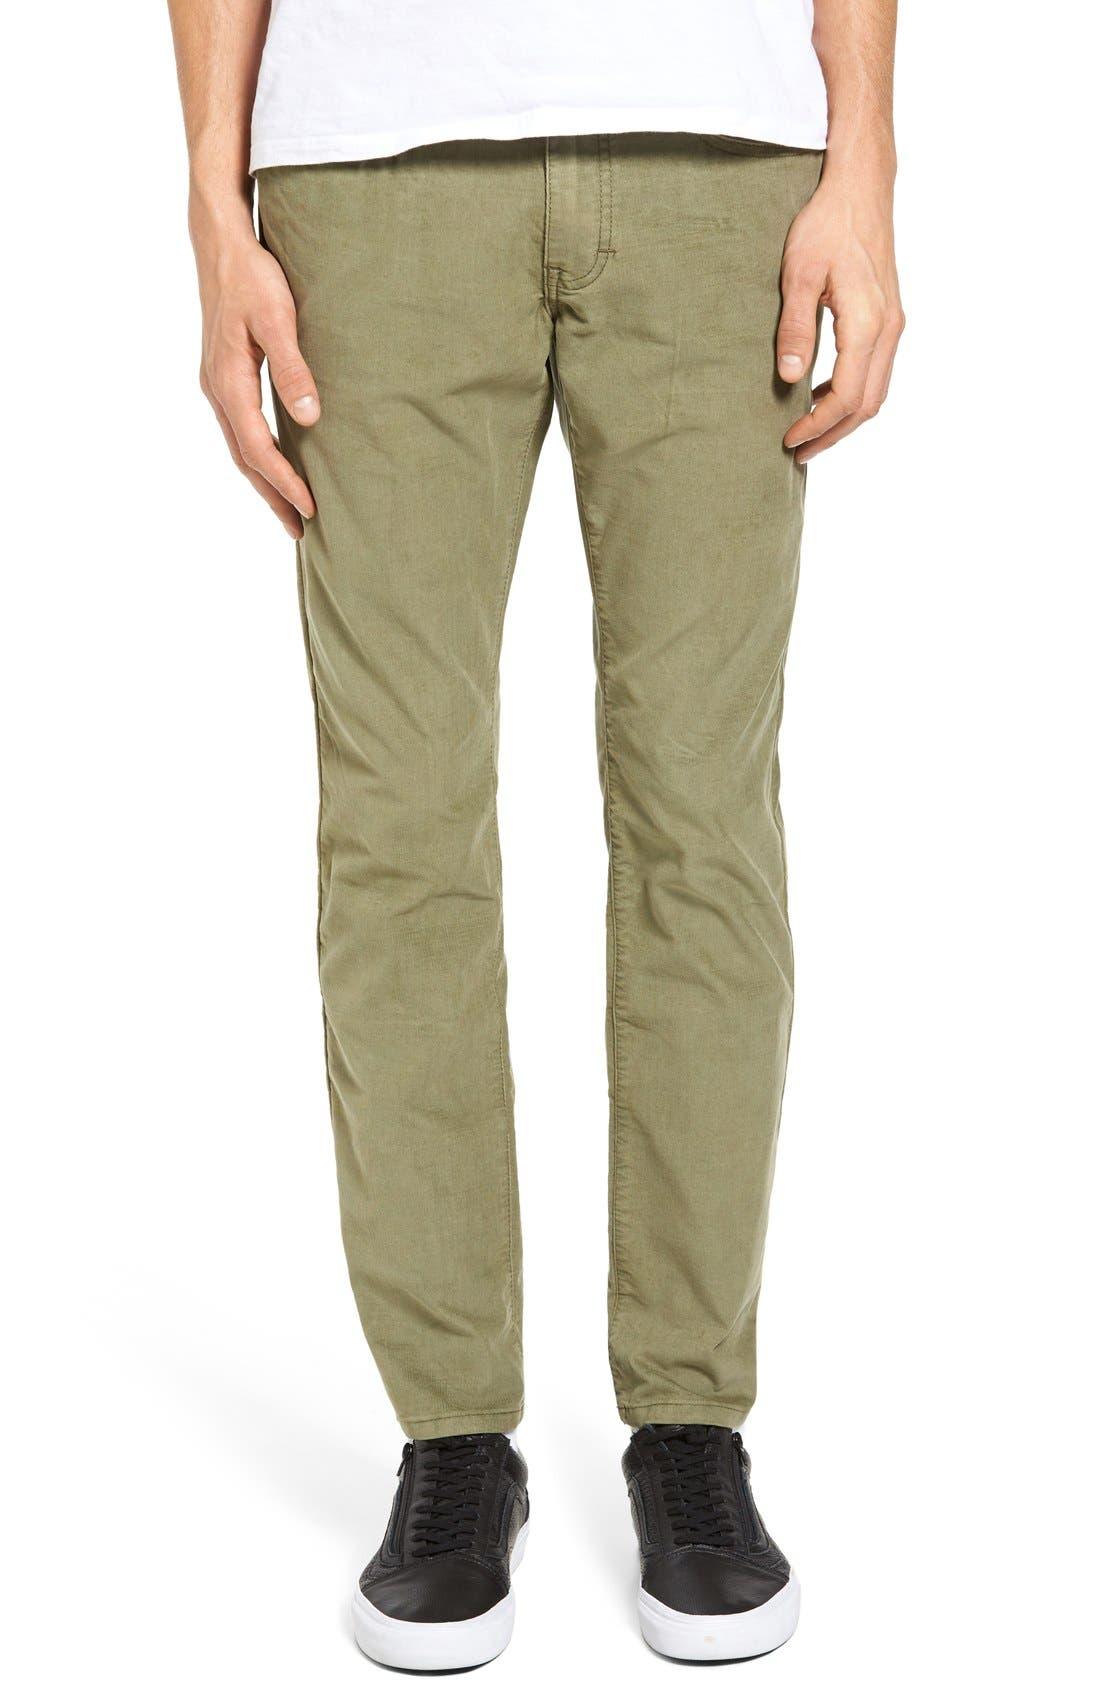 Bryce Chopper Slim Fit Corduroy Pants,                             Main thumbnail 1, color,                             302